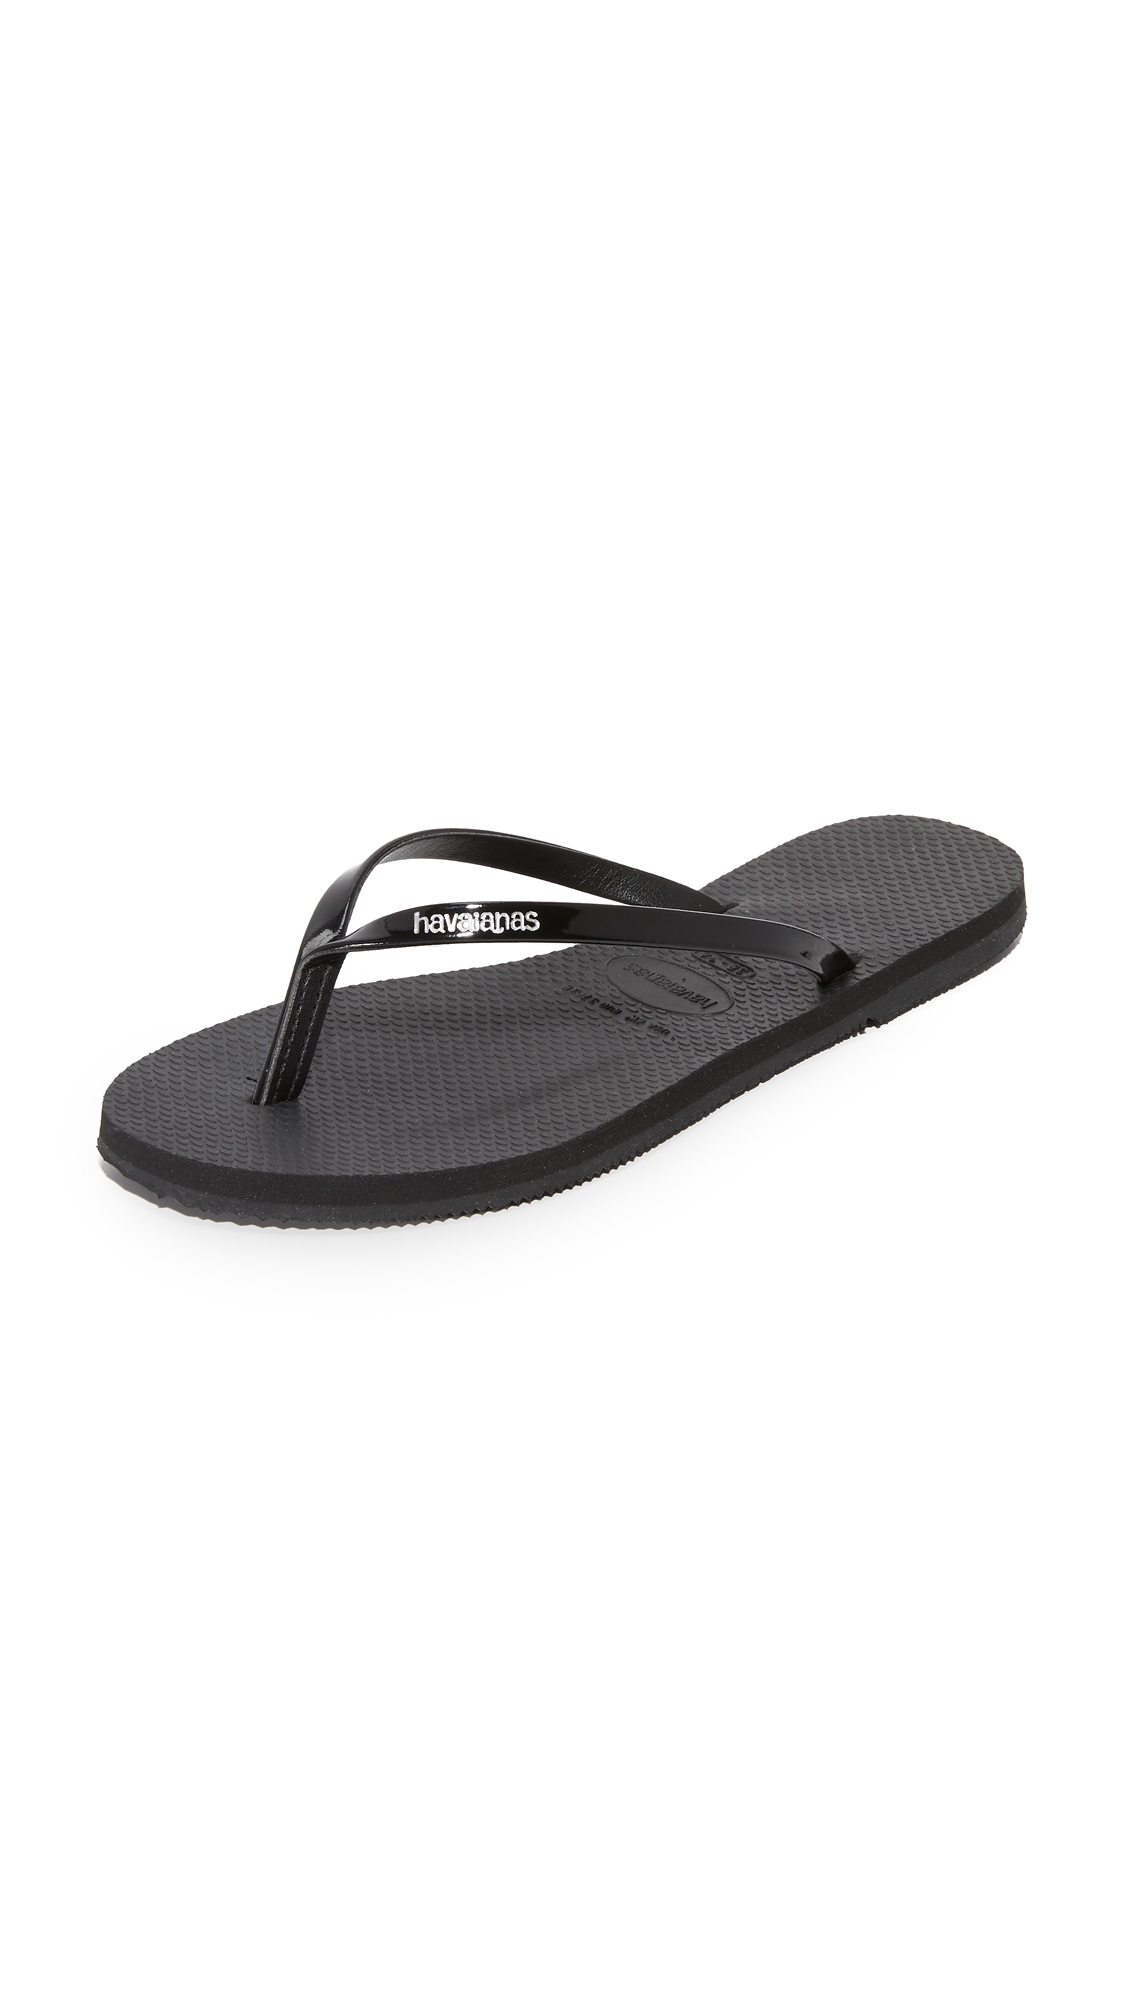 Havaianas You Metallic Flip Flops - Black at Shopbop